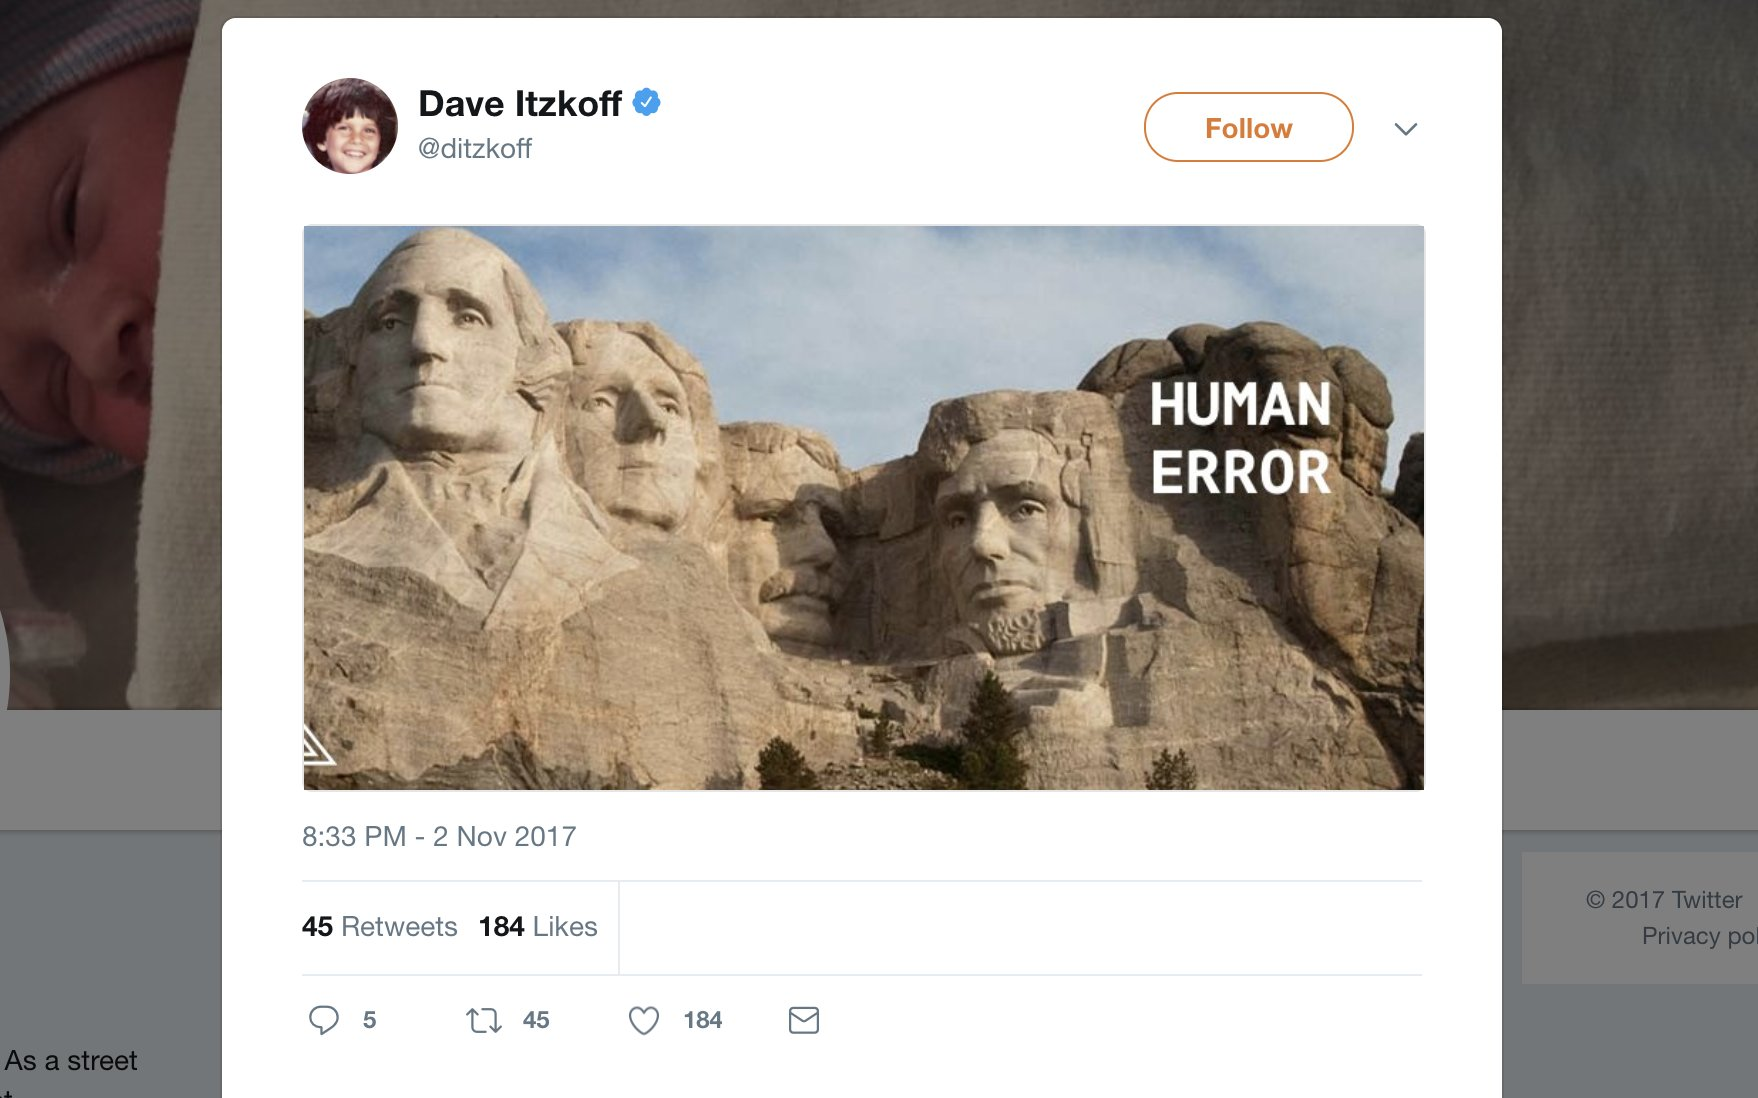 Social media users praise Twitter employee who deactivated Trump's account https://t.co/QXWafeO8ia https://t.co/RnIJ0gB6Da